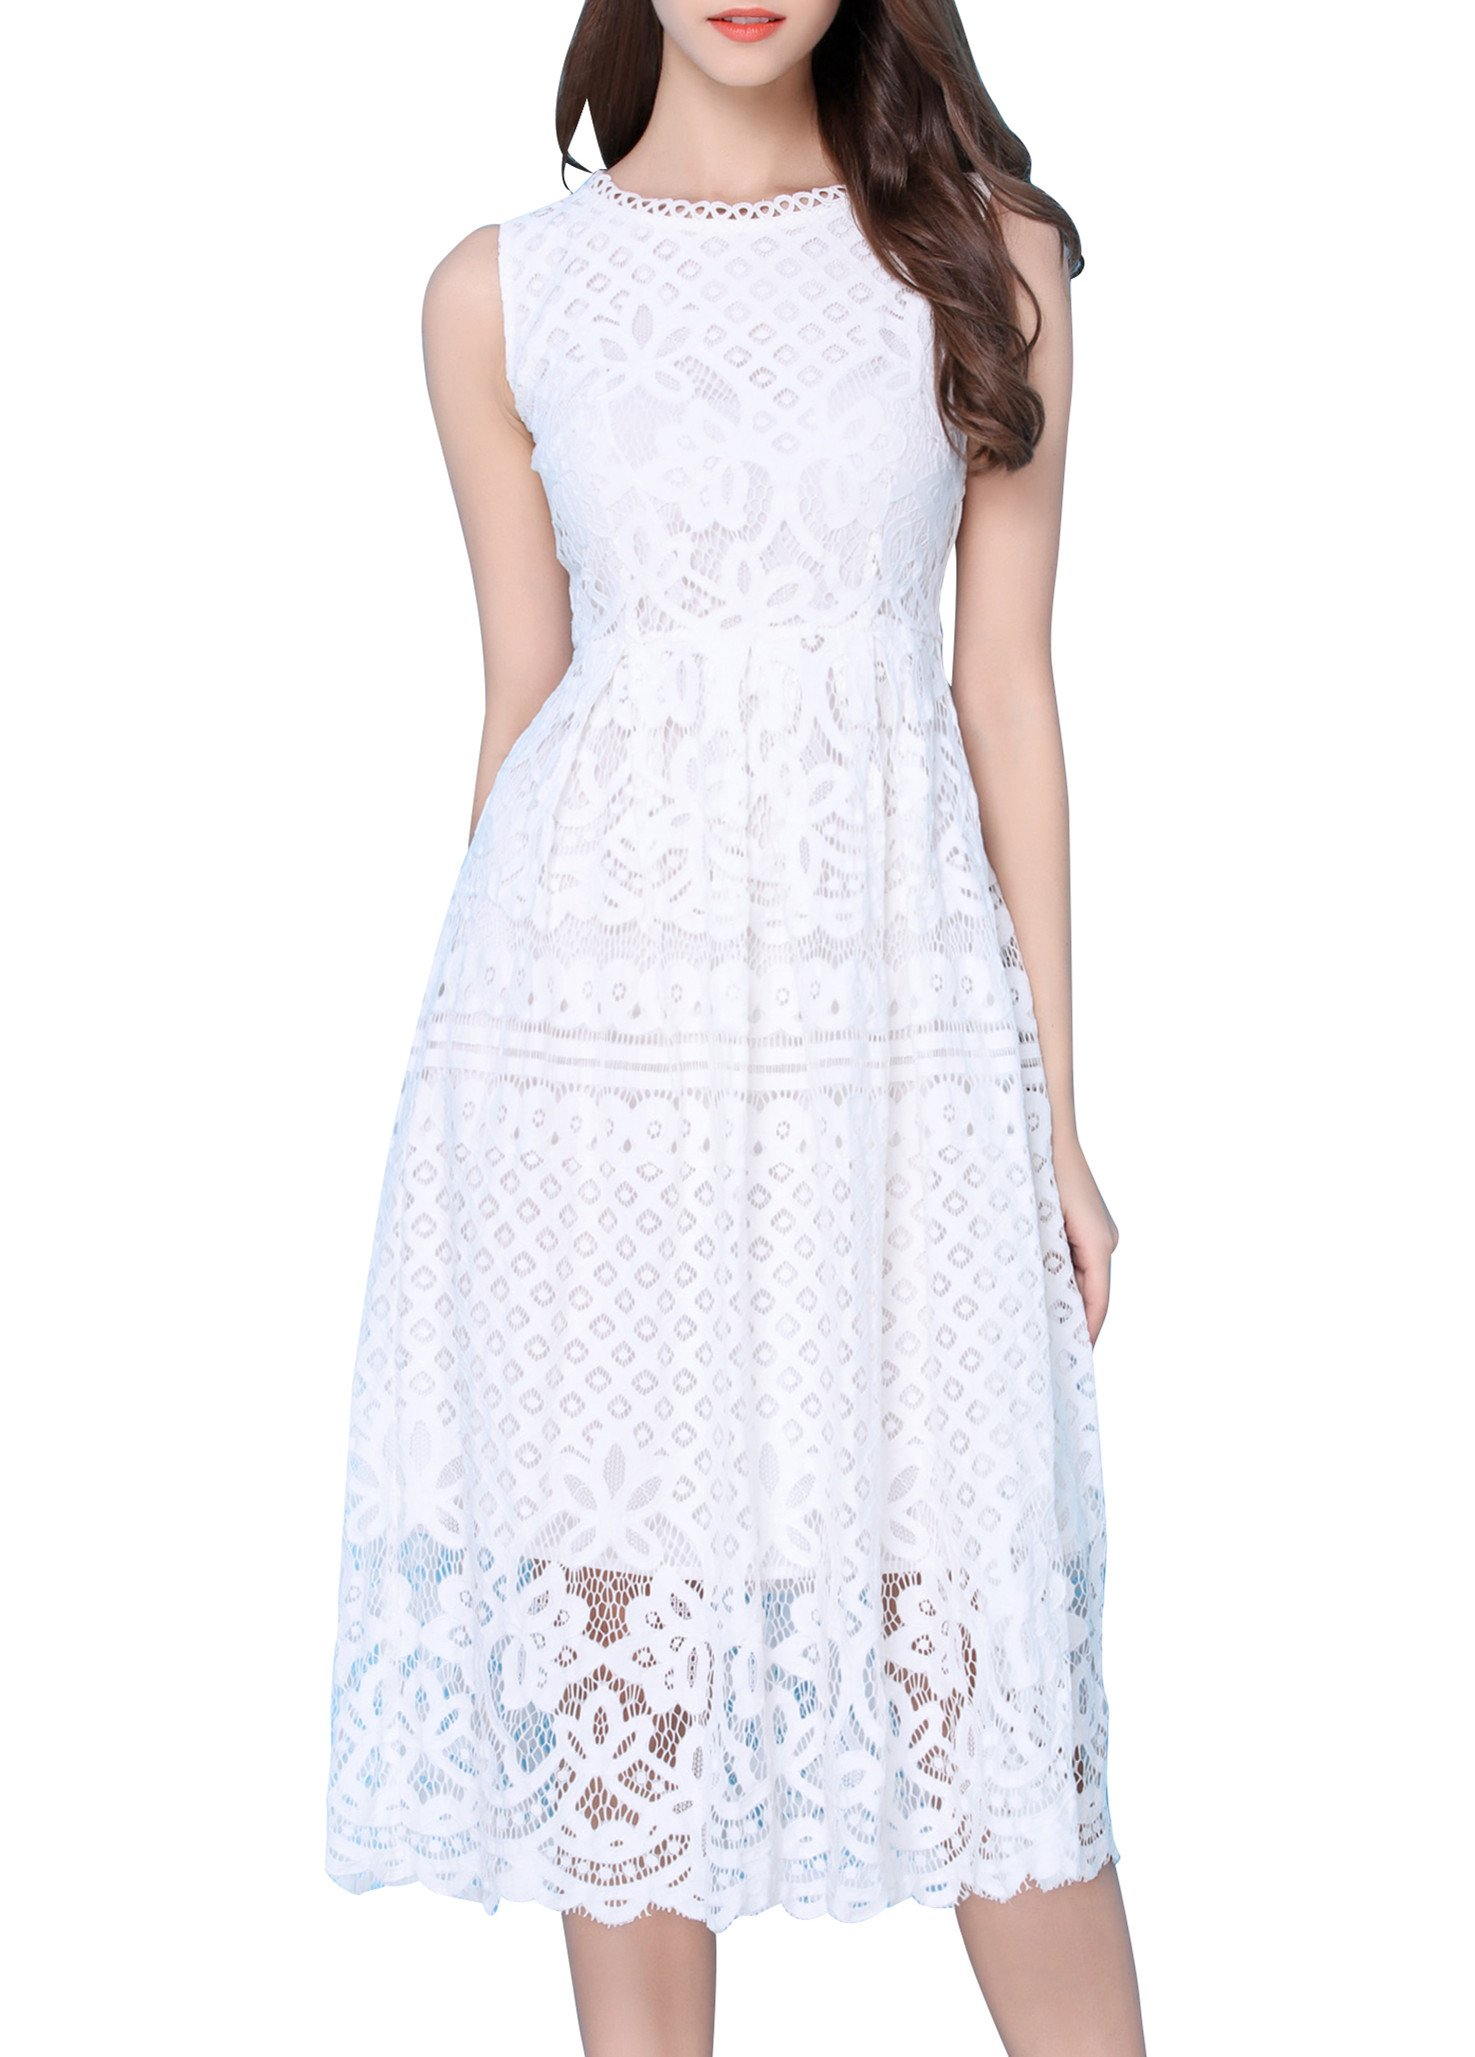 White Dress - Women's Loose Oversize Turtleneck Wool Long Pullover Sweater Dress